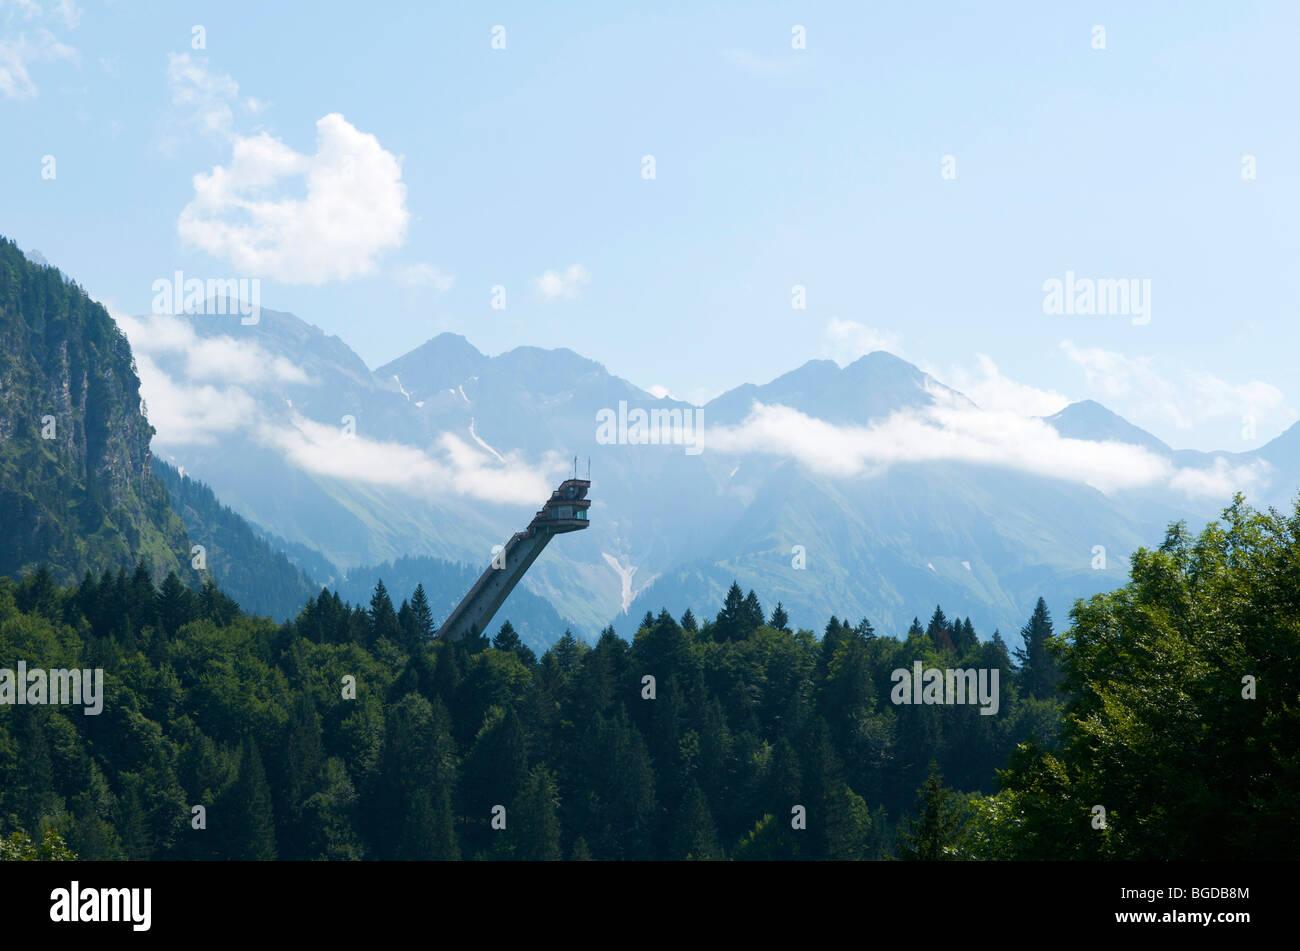 Heini-Klopfer-Skiflugschanze ski flying hill, Oberstdorf, Allgaeu, Bavaria, Germany, Europe - Stock Image